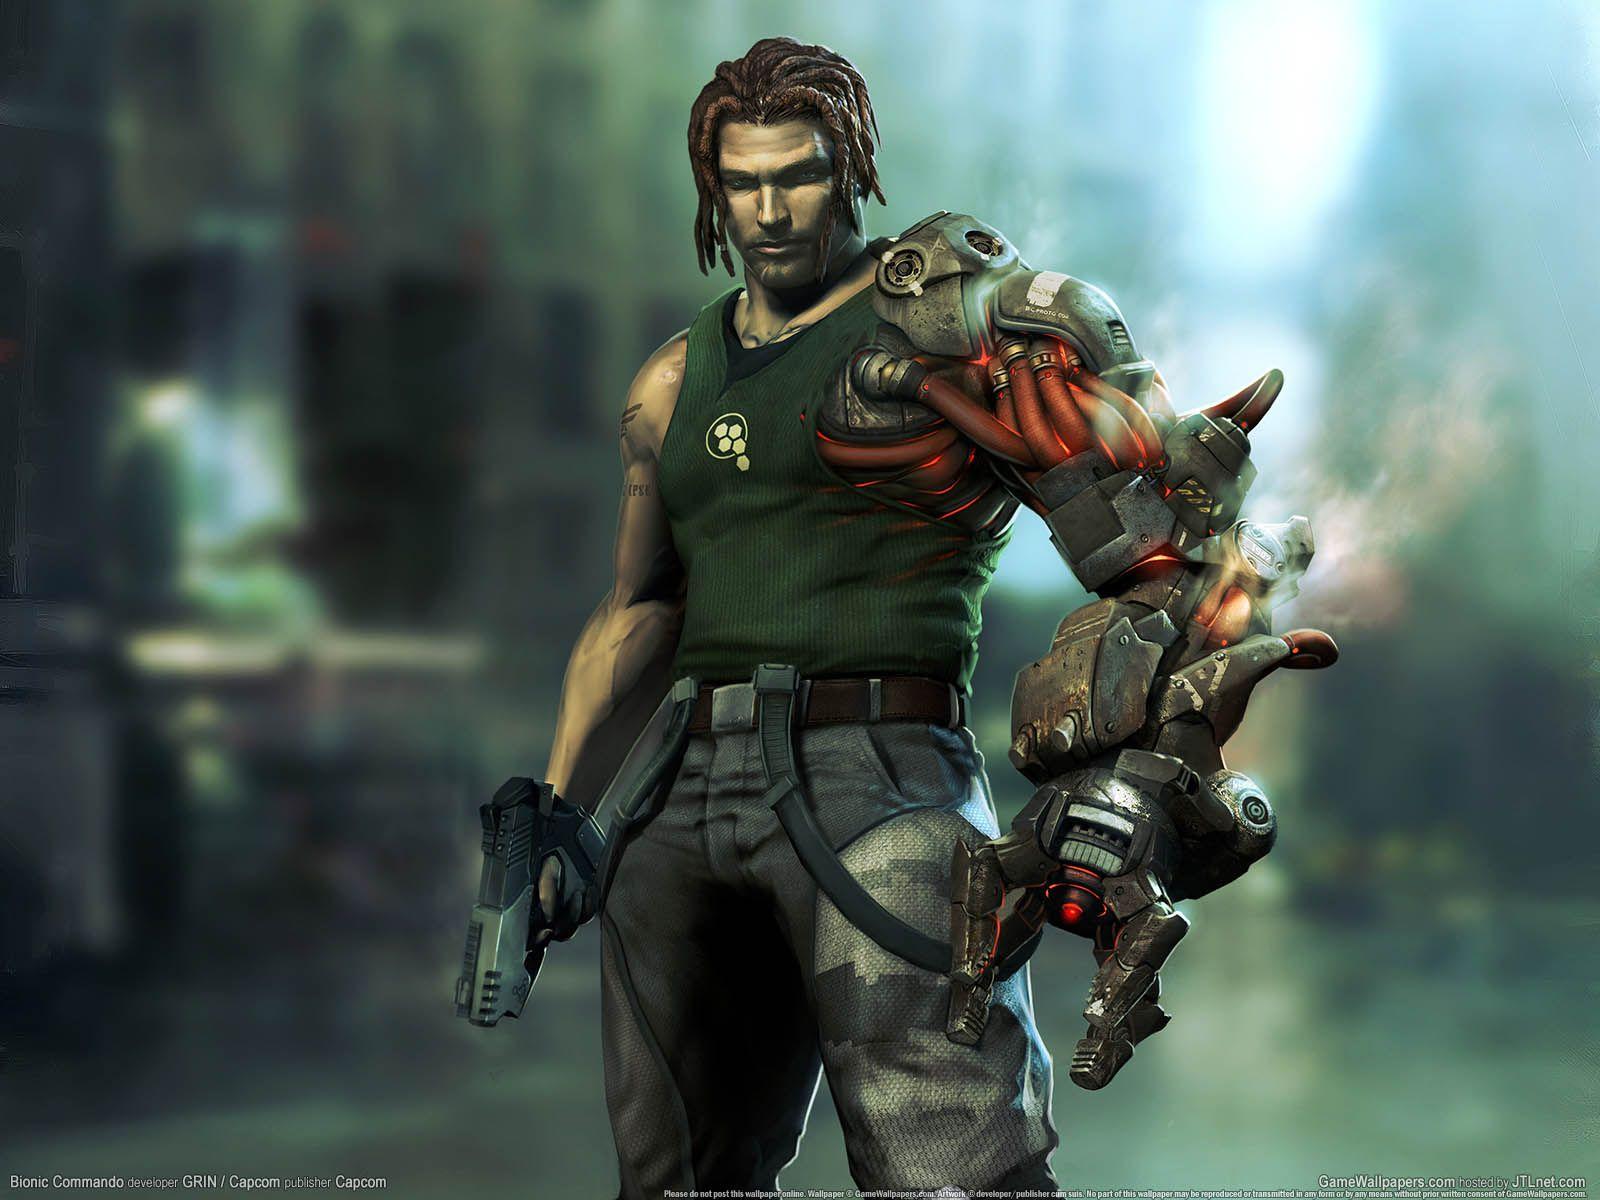 Bionic Commando art, Commando, games